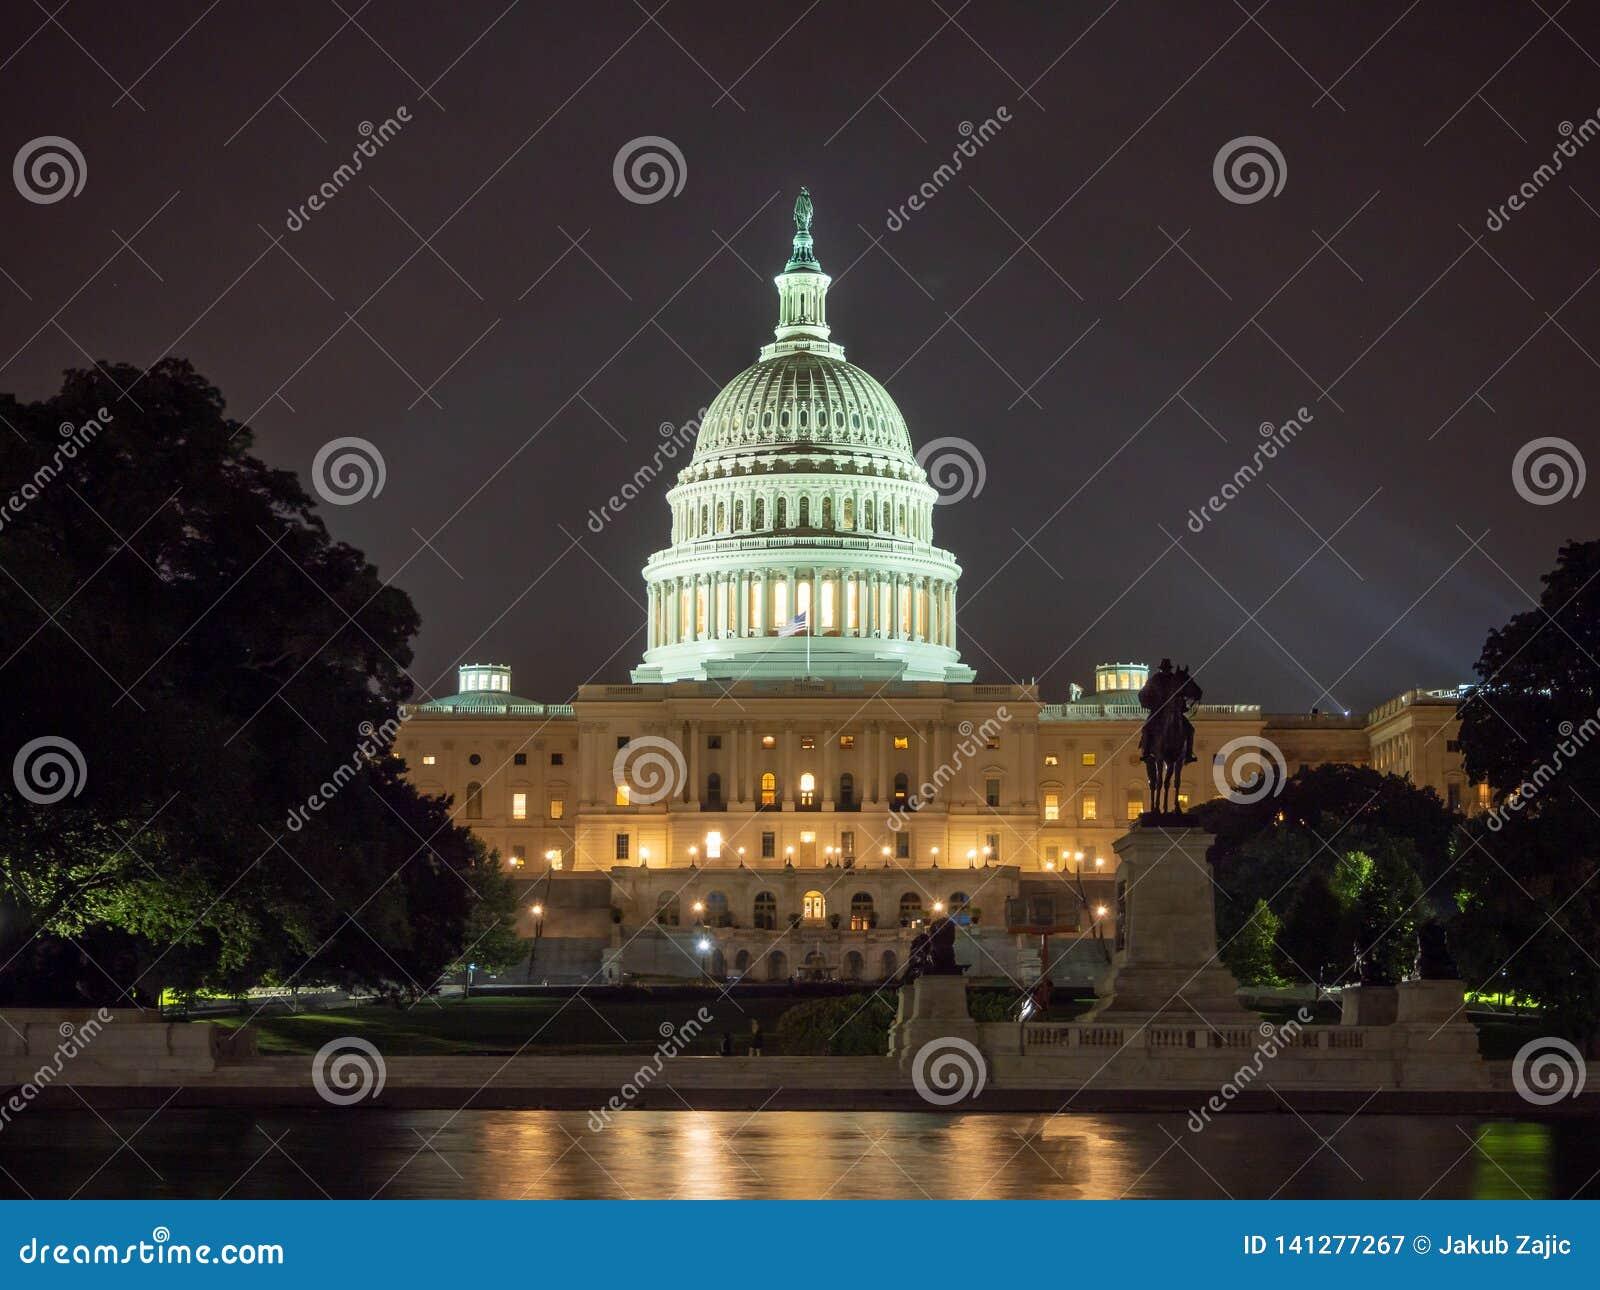 Washington DC, Περιοχή της Κολούμπια [Ηνωμένο ΗΠΑ Capitol κτήριο, άποψη νύχτας με φως πέρα από την απεικόνιση της λίμνης,